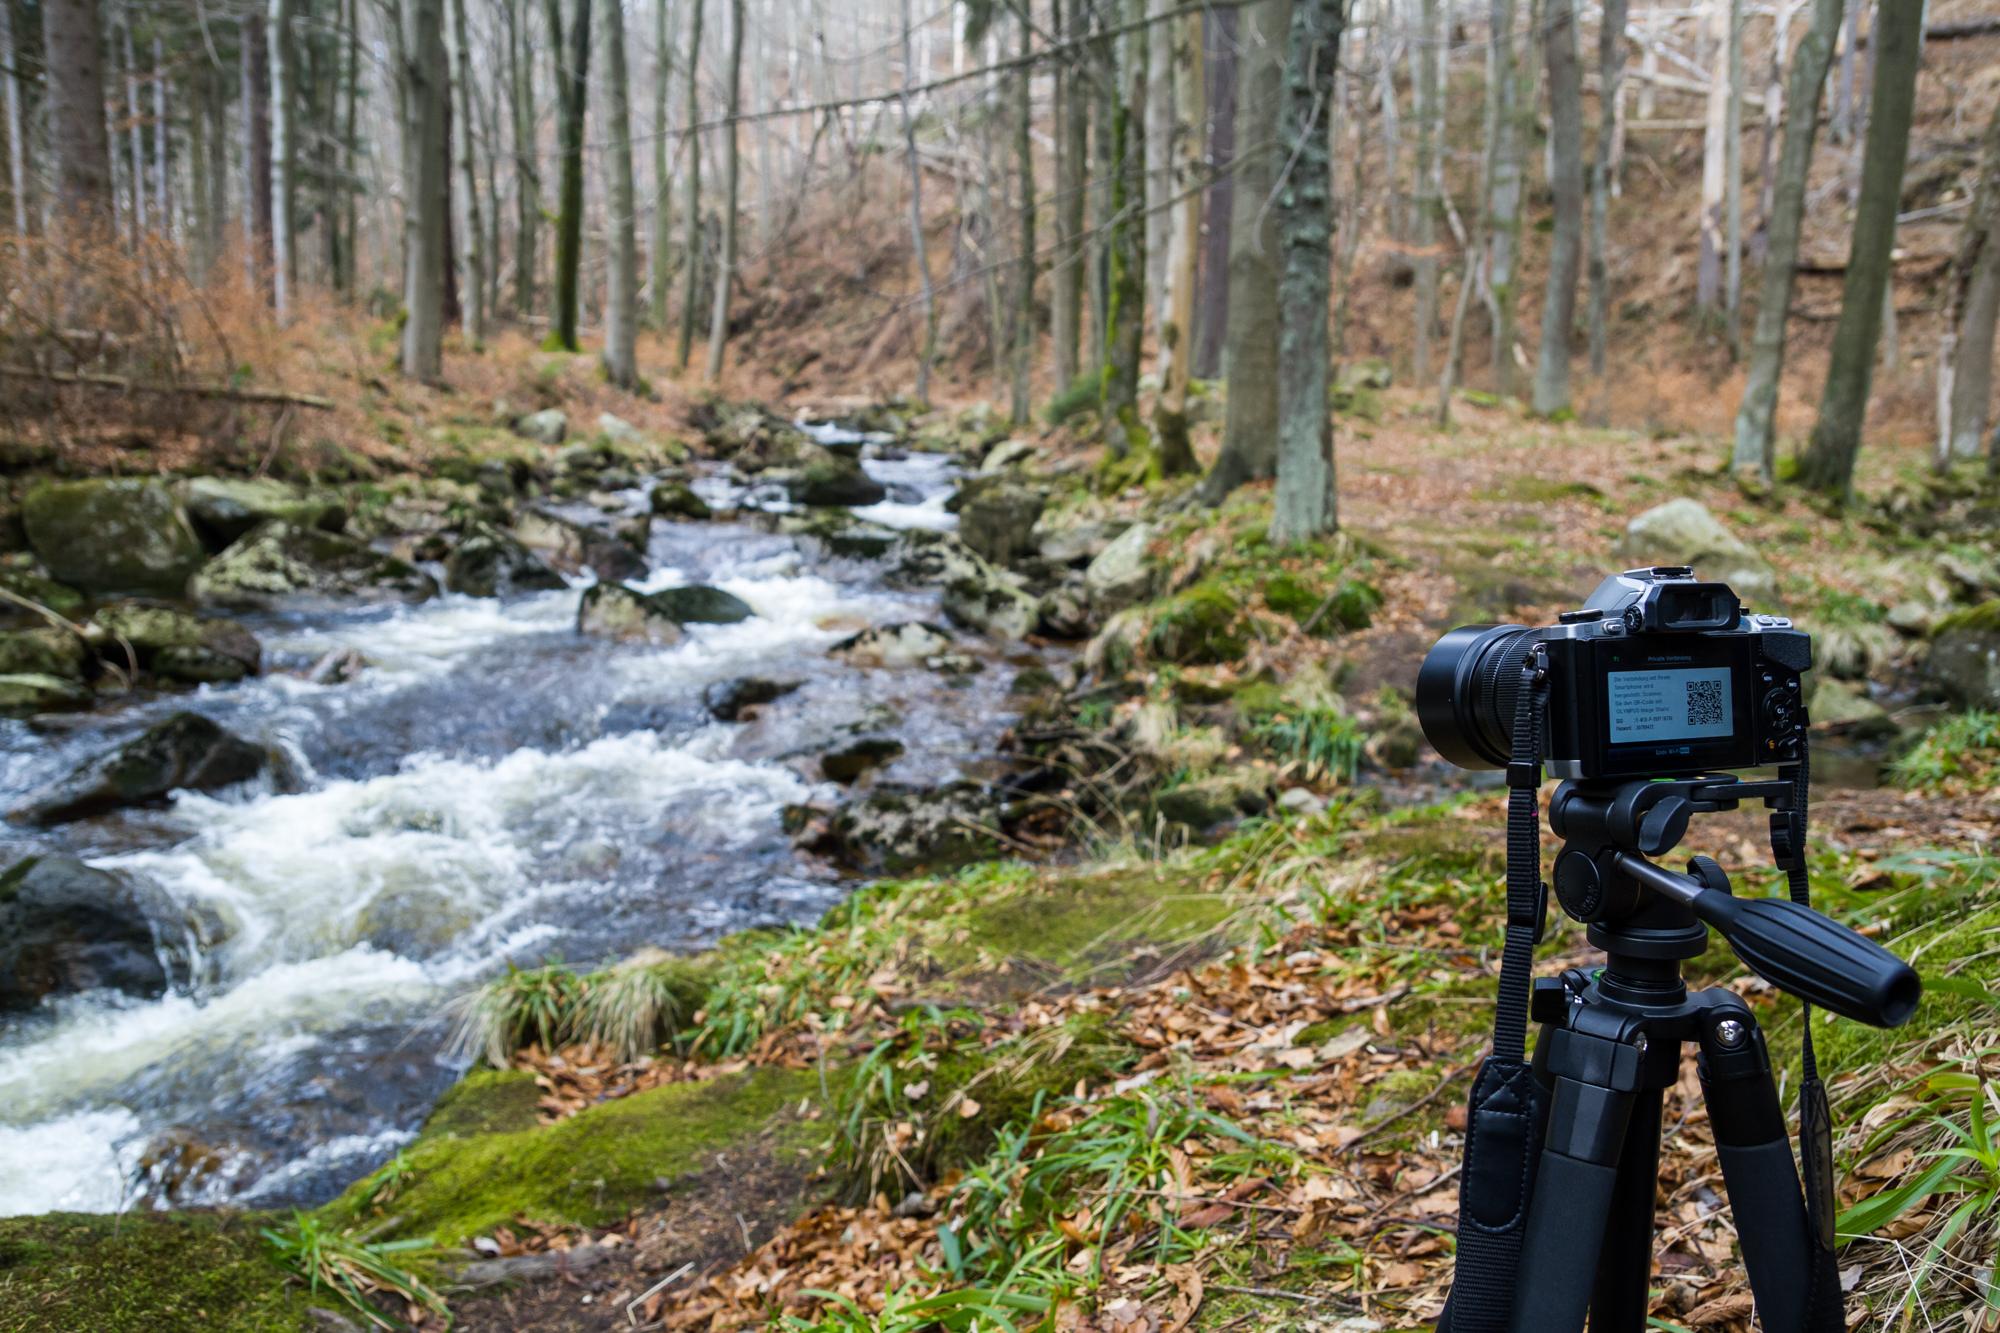 Fotokurs Erste Schritte in die digitale Fotografie